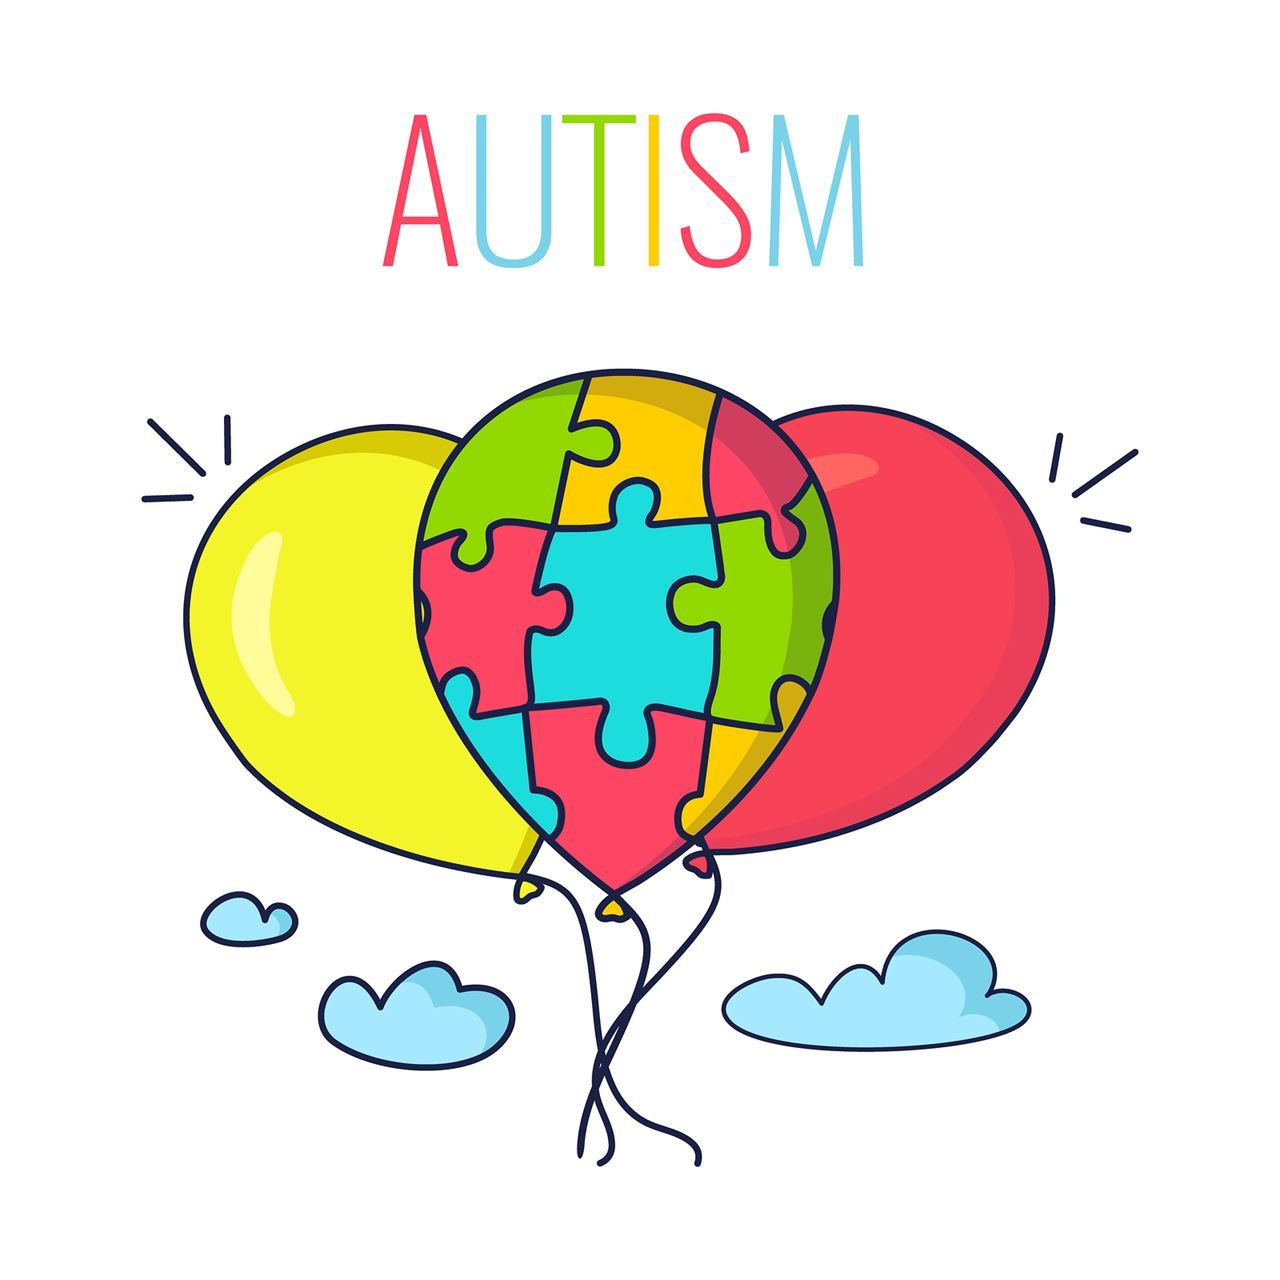 Schema therapy society forum. Autism clipart autism spectrum disorder